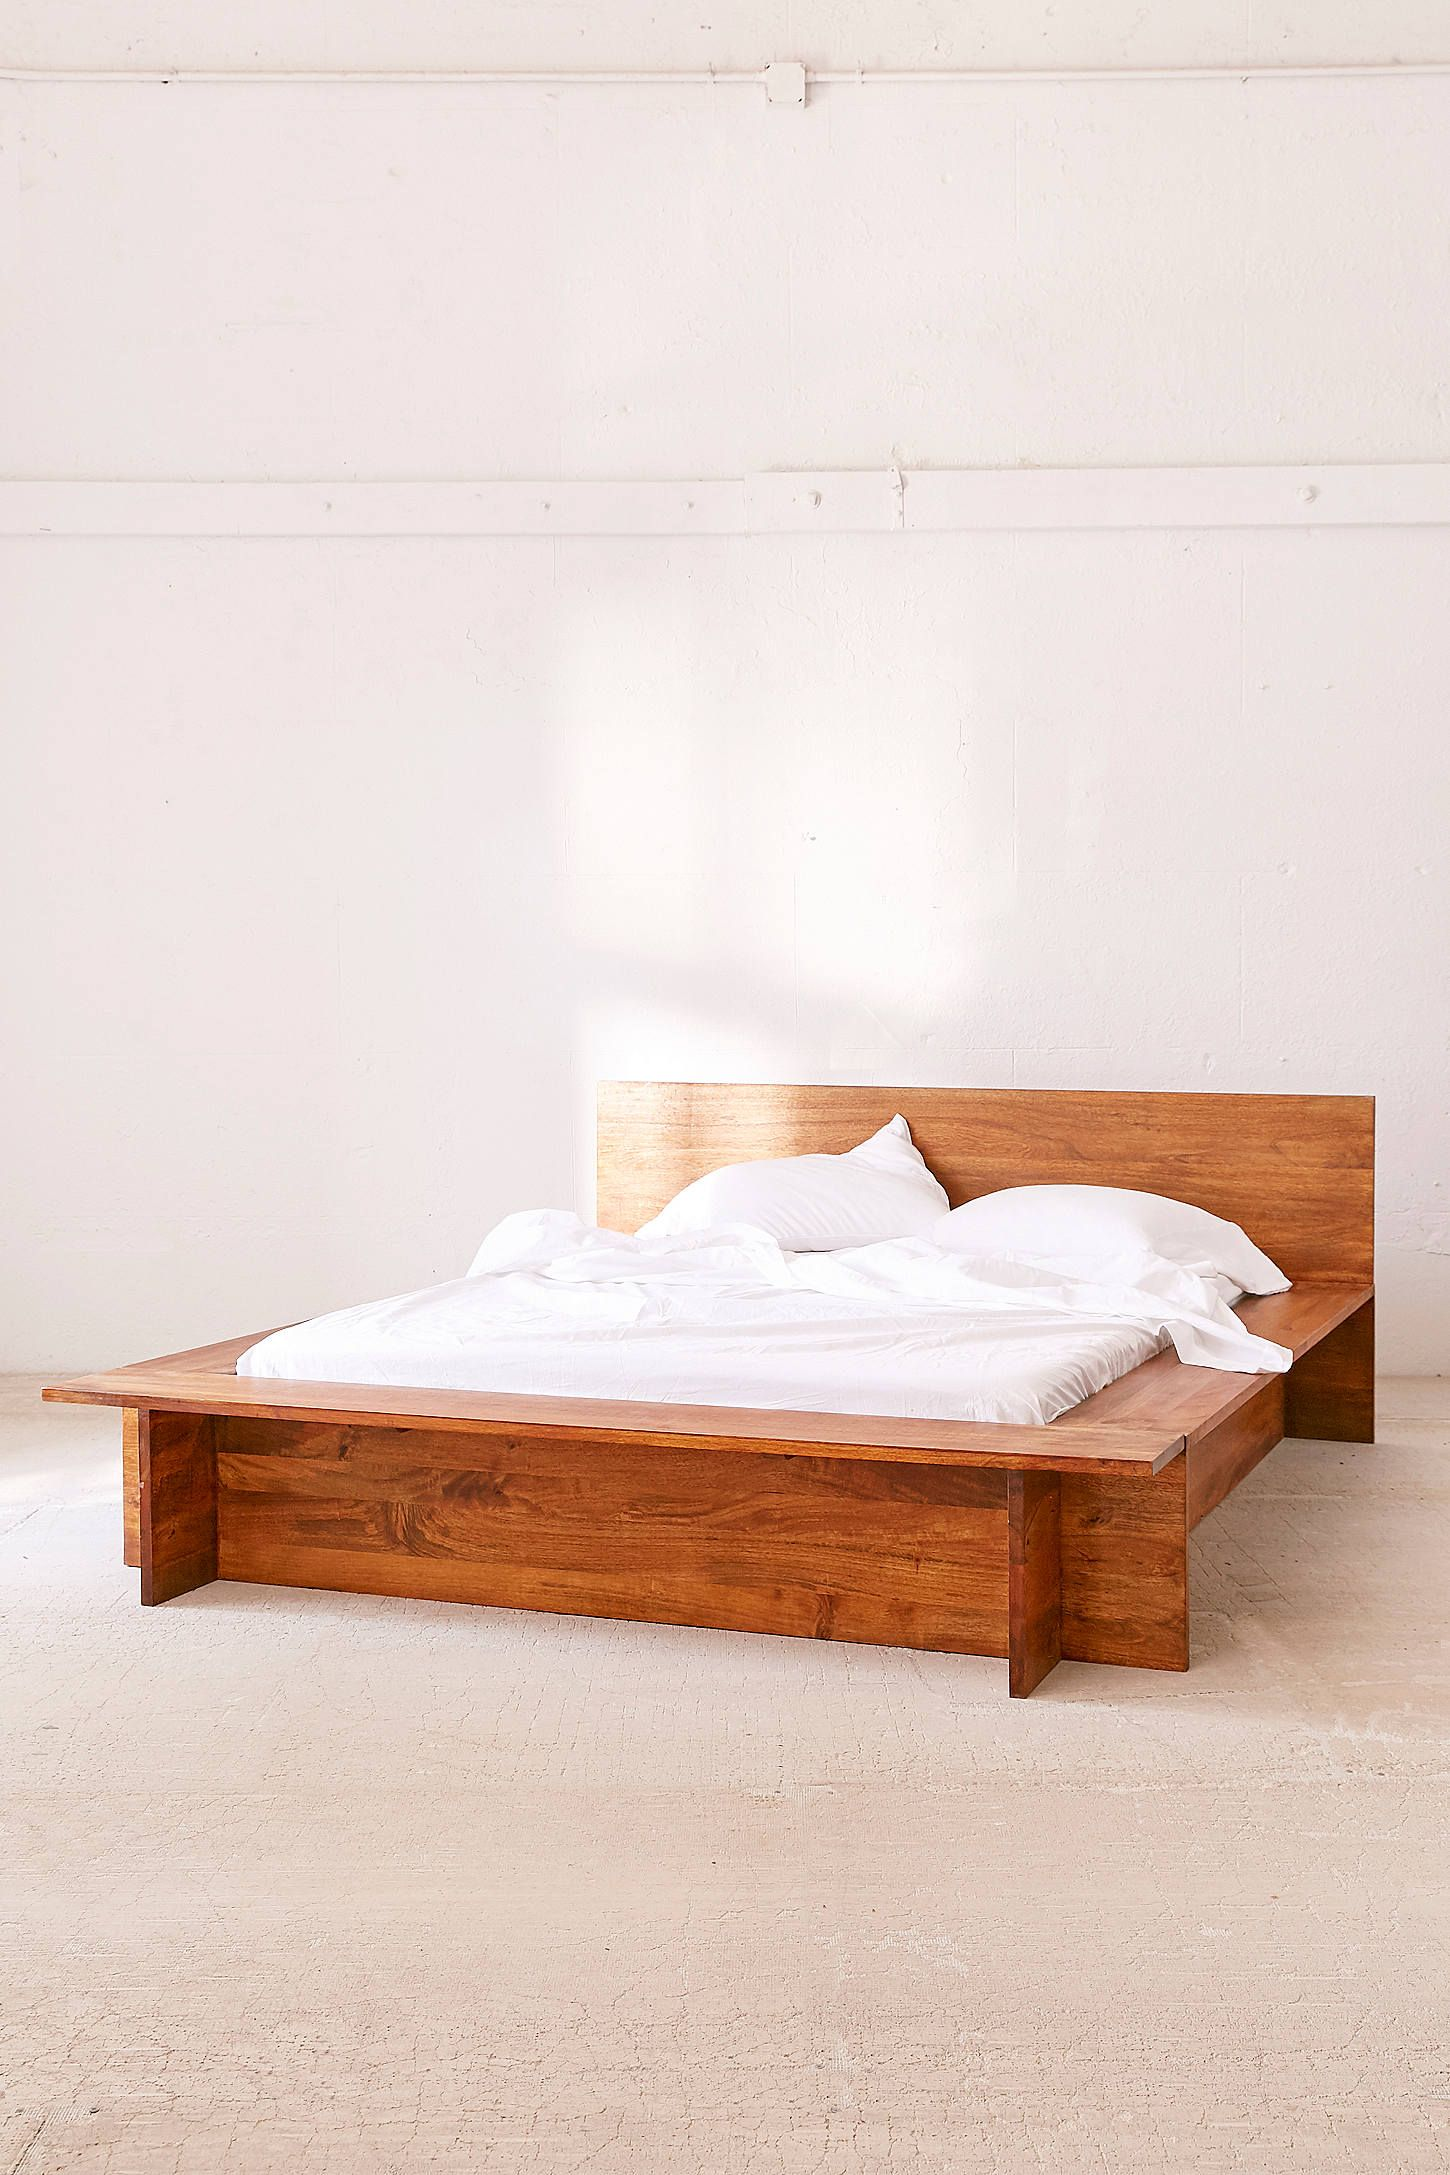 Modern Boho Media Stand   Boho bed frame, Platform bed ... on Modern Boho Bed Frame  id=25096